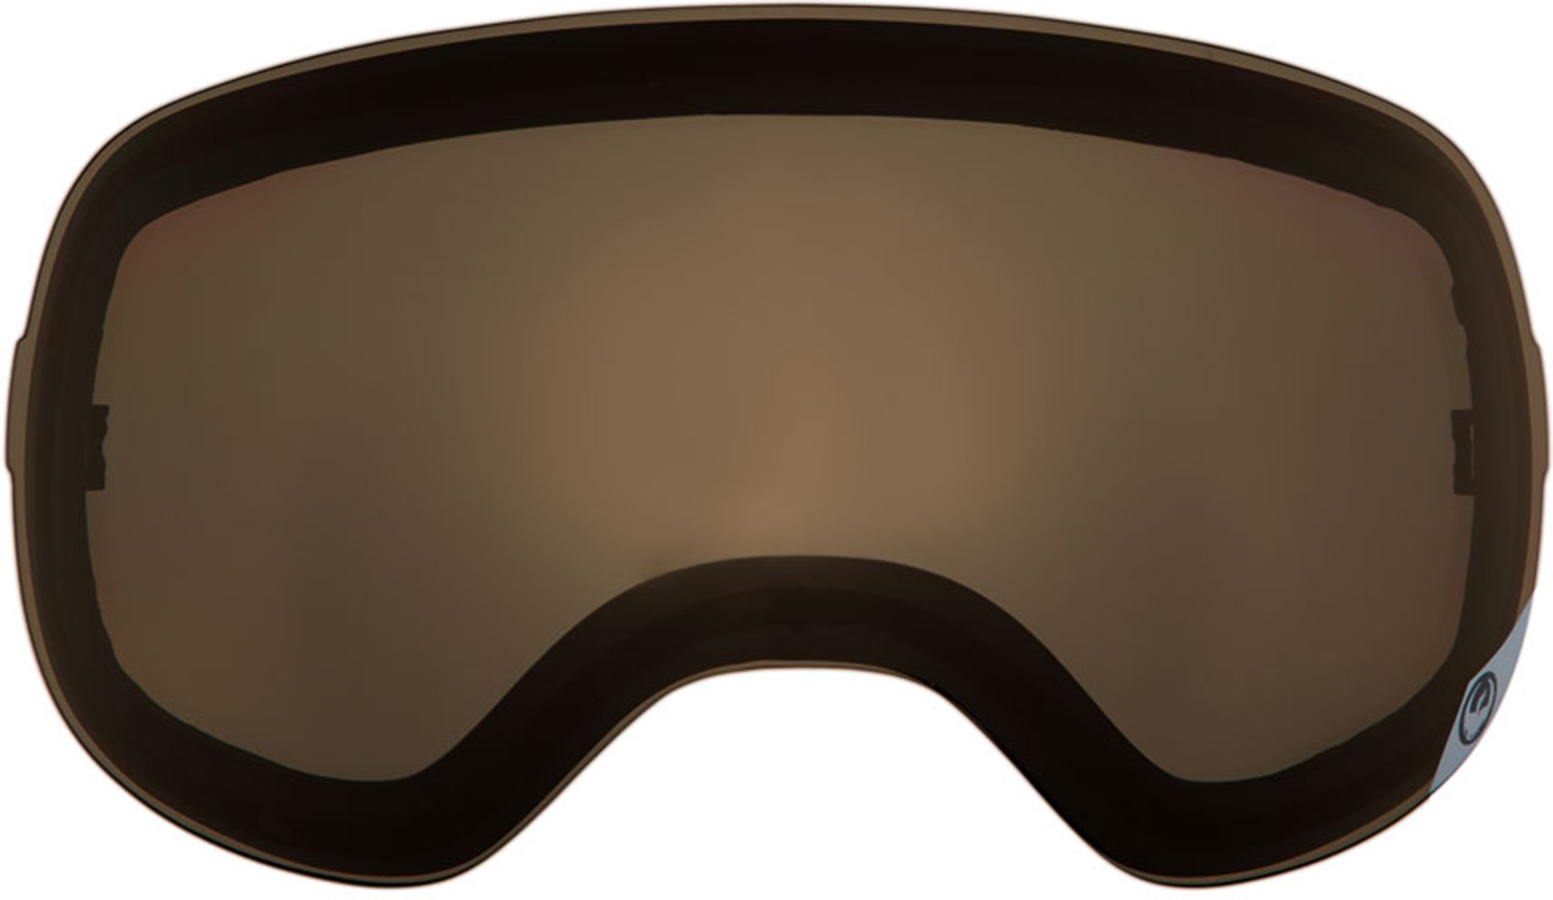 Dragon D3 Snowboard/Ski Goggles Spare Lens, One Size, Jet